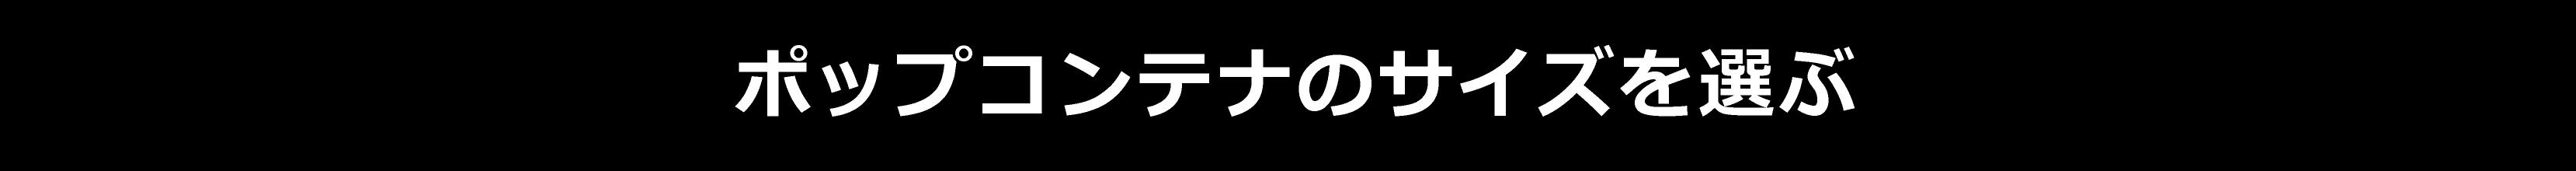 OXOポップコンテナサイズ選び